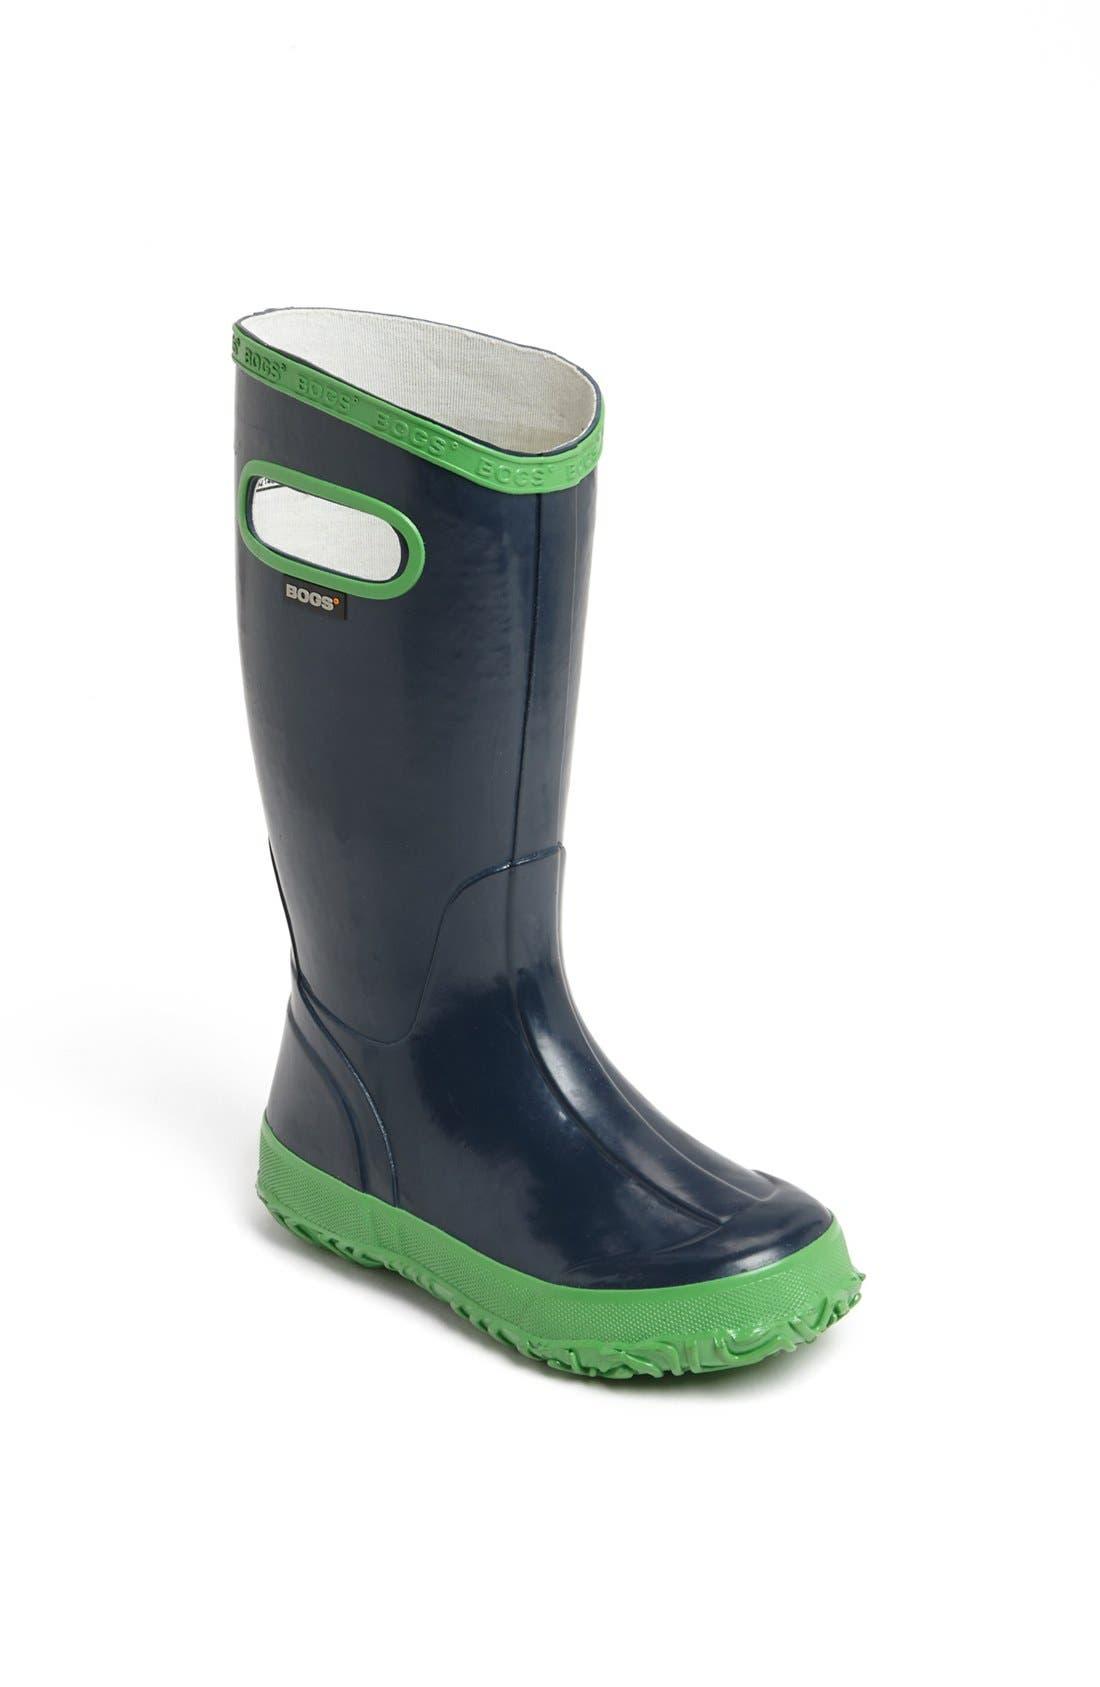 Rubber Rain Boot,                         Main,                         color, Navy/ Green